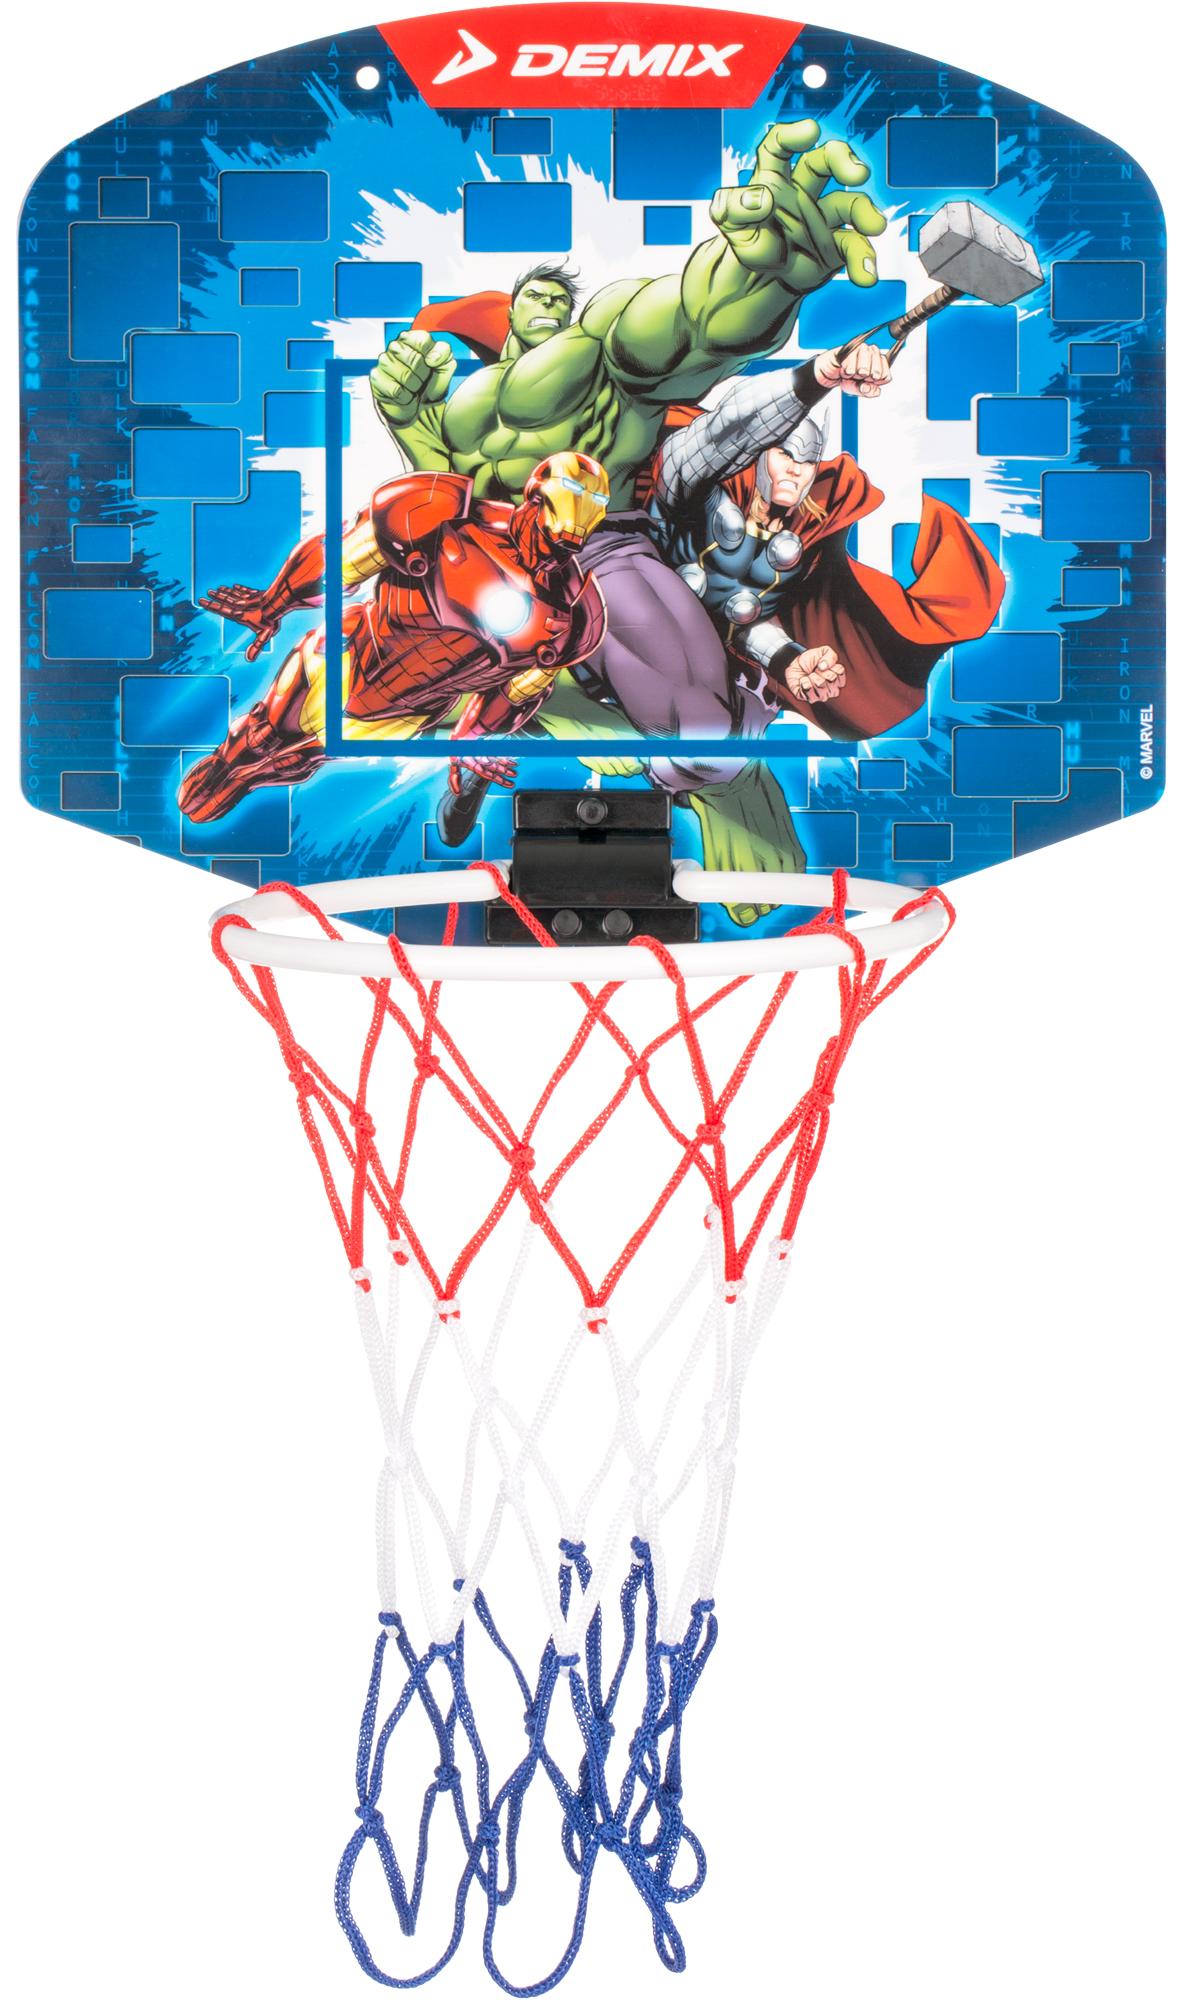 Demix Набор для баскетбола: мяч и щит Demix цена